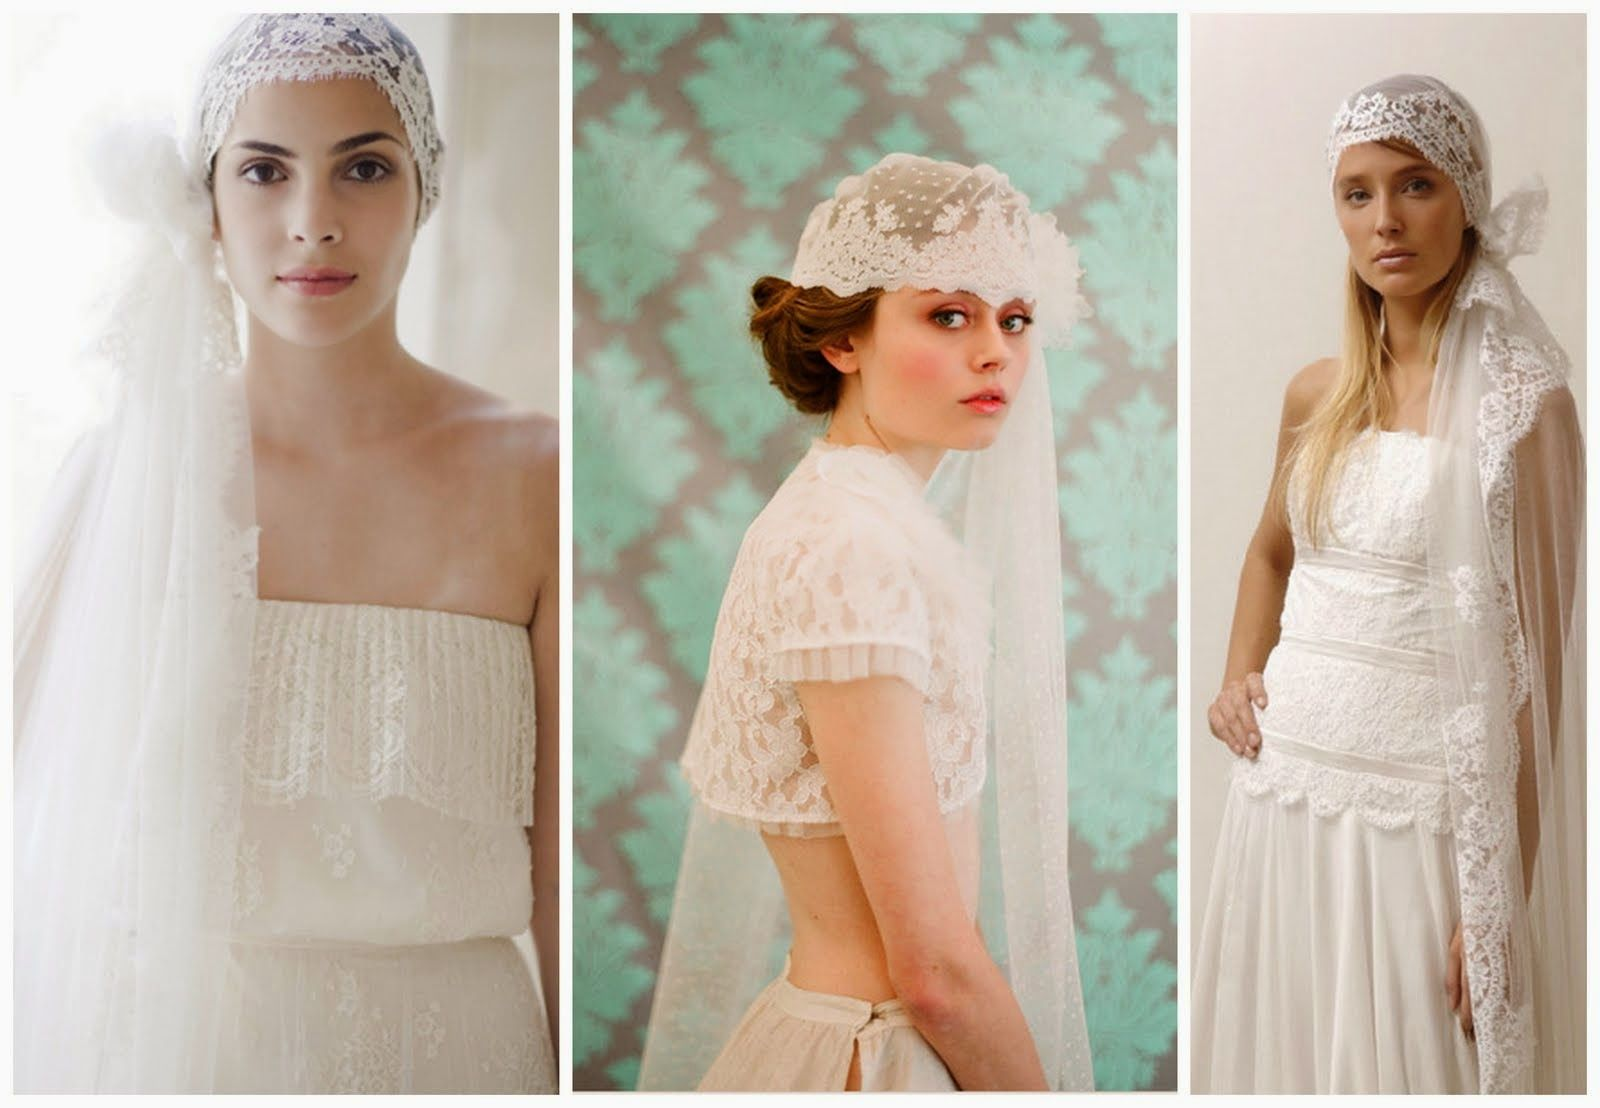 wedding spirit blog de mariage coiffure de mariée voile de